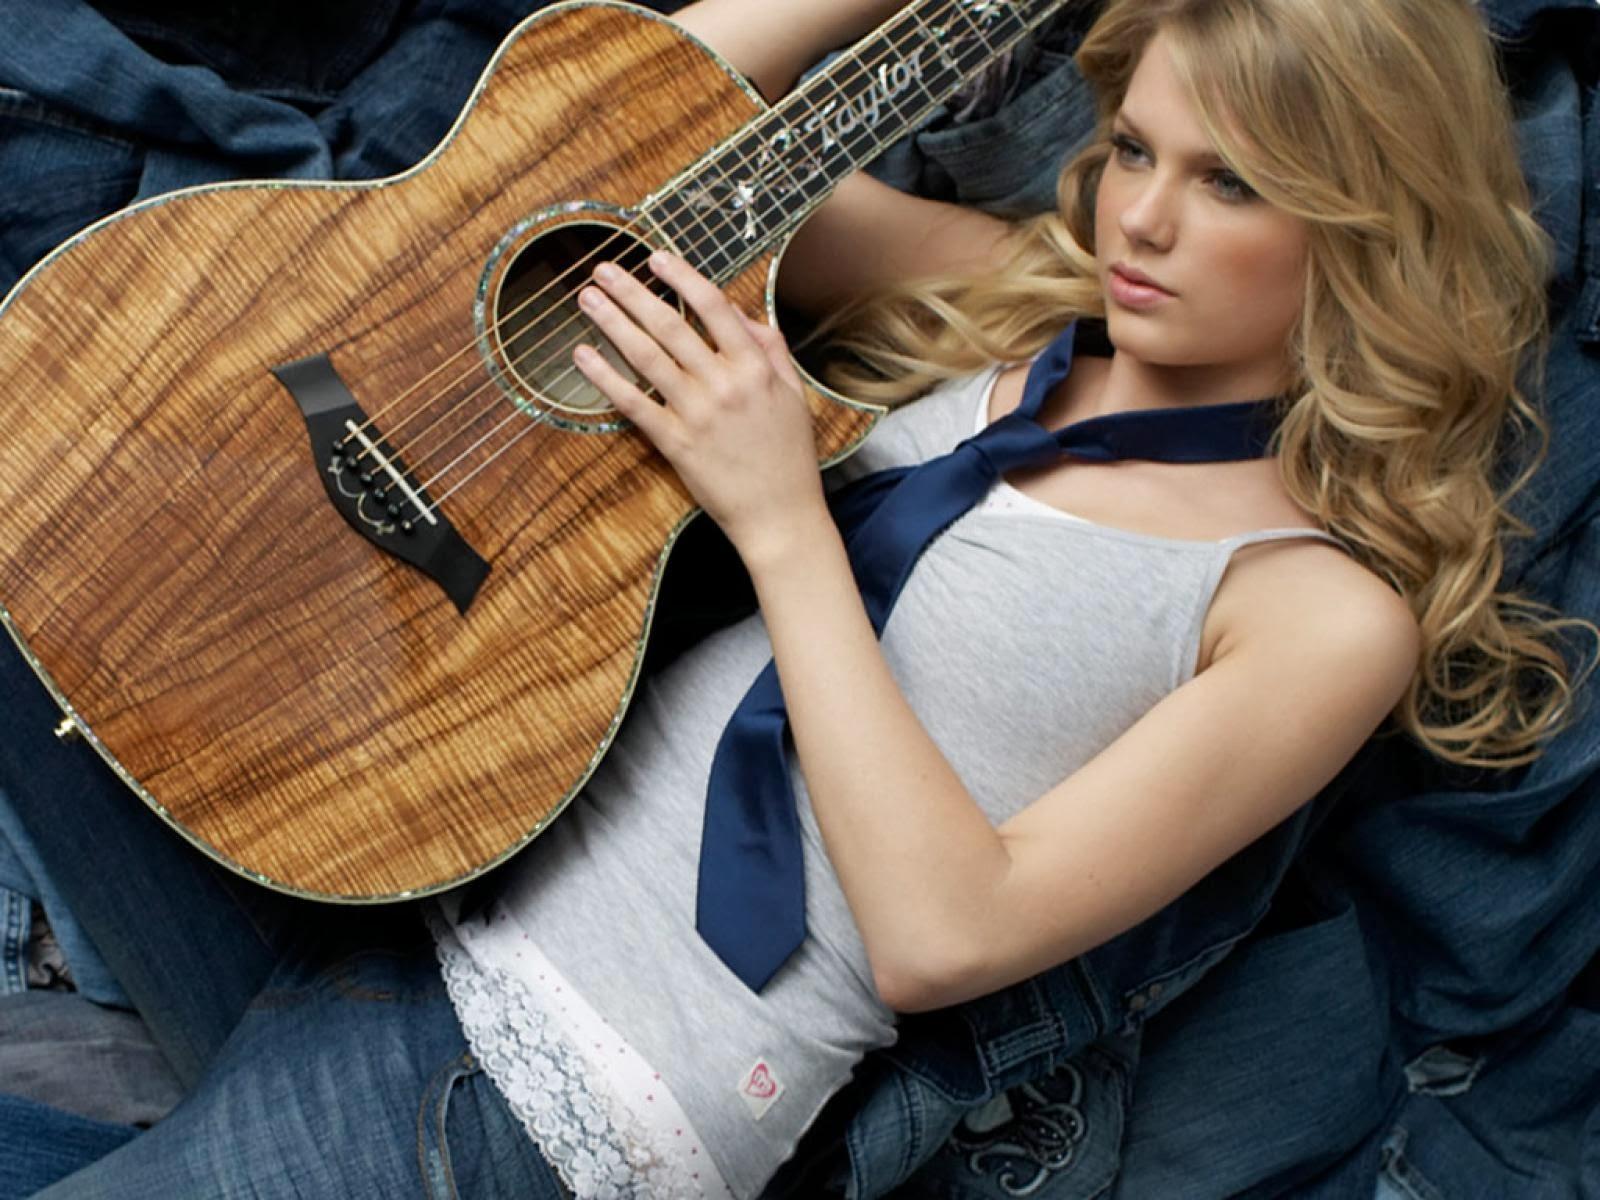 Fondo de Pantalla Famosas Taylor Swift tumbada con su guitarra ...